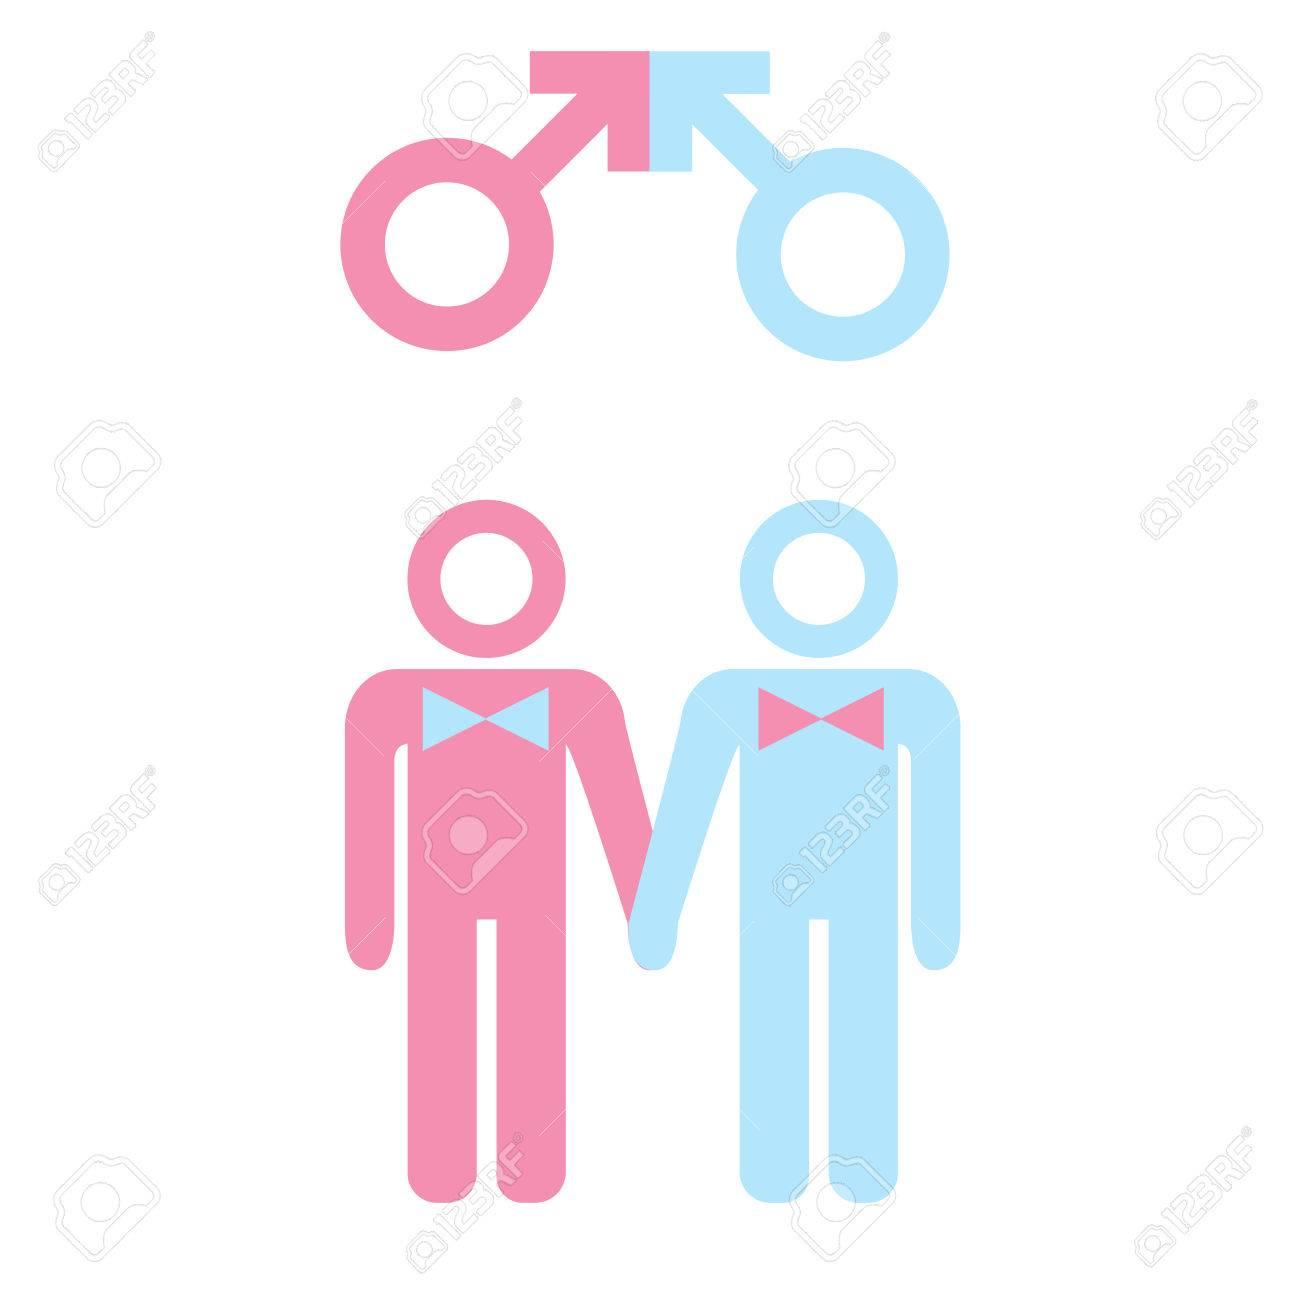 bianco gay uomini sesso